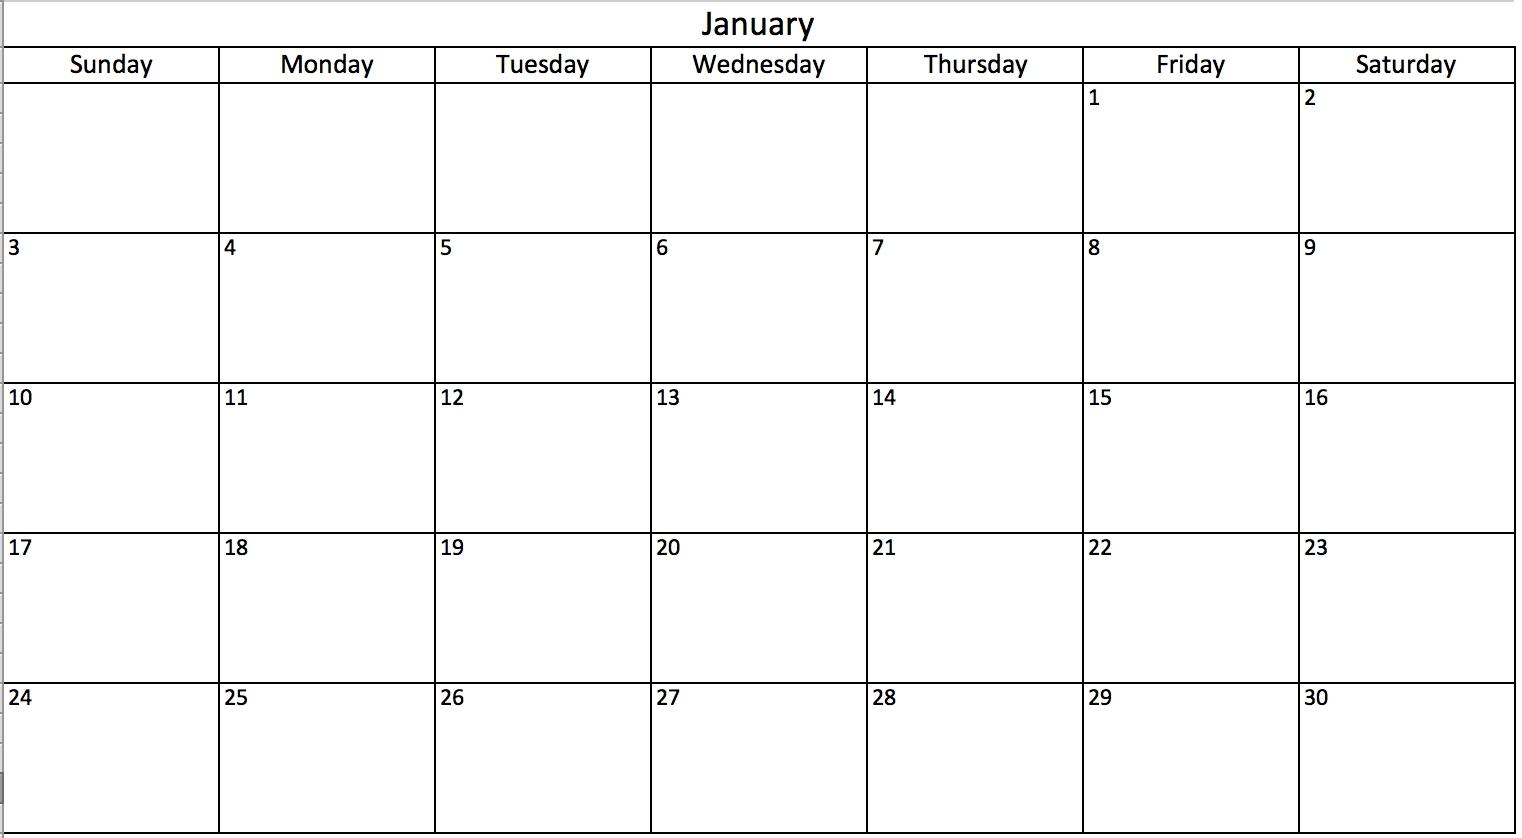 Make A 2018 Calendar In Excel (Includes Free Template)  Schedule Of Activities Calendar Format